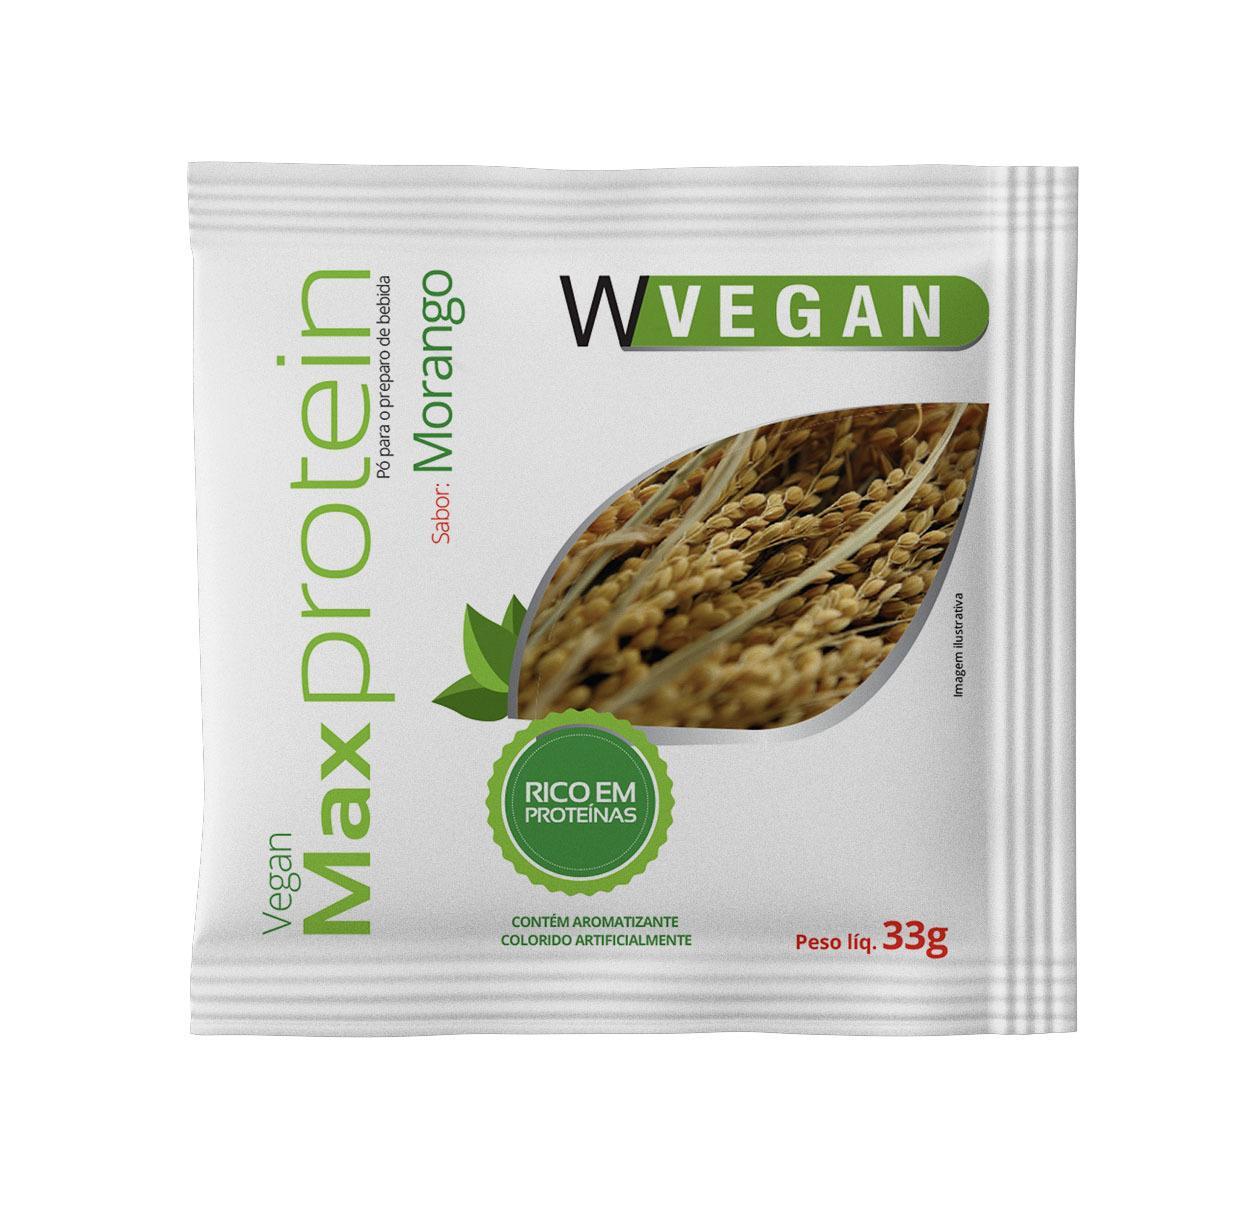 Max Protein 33g Sache Morango WVegan